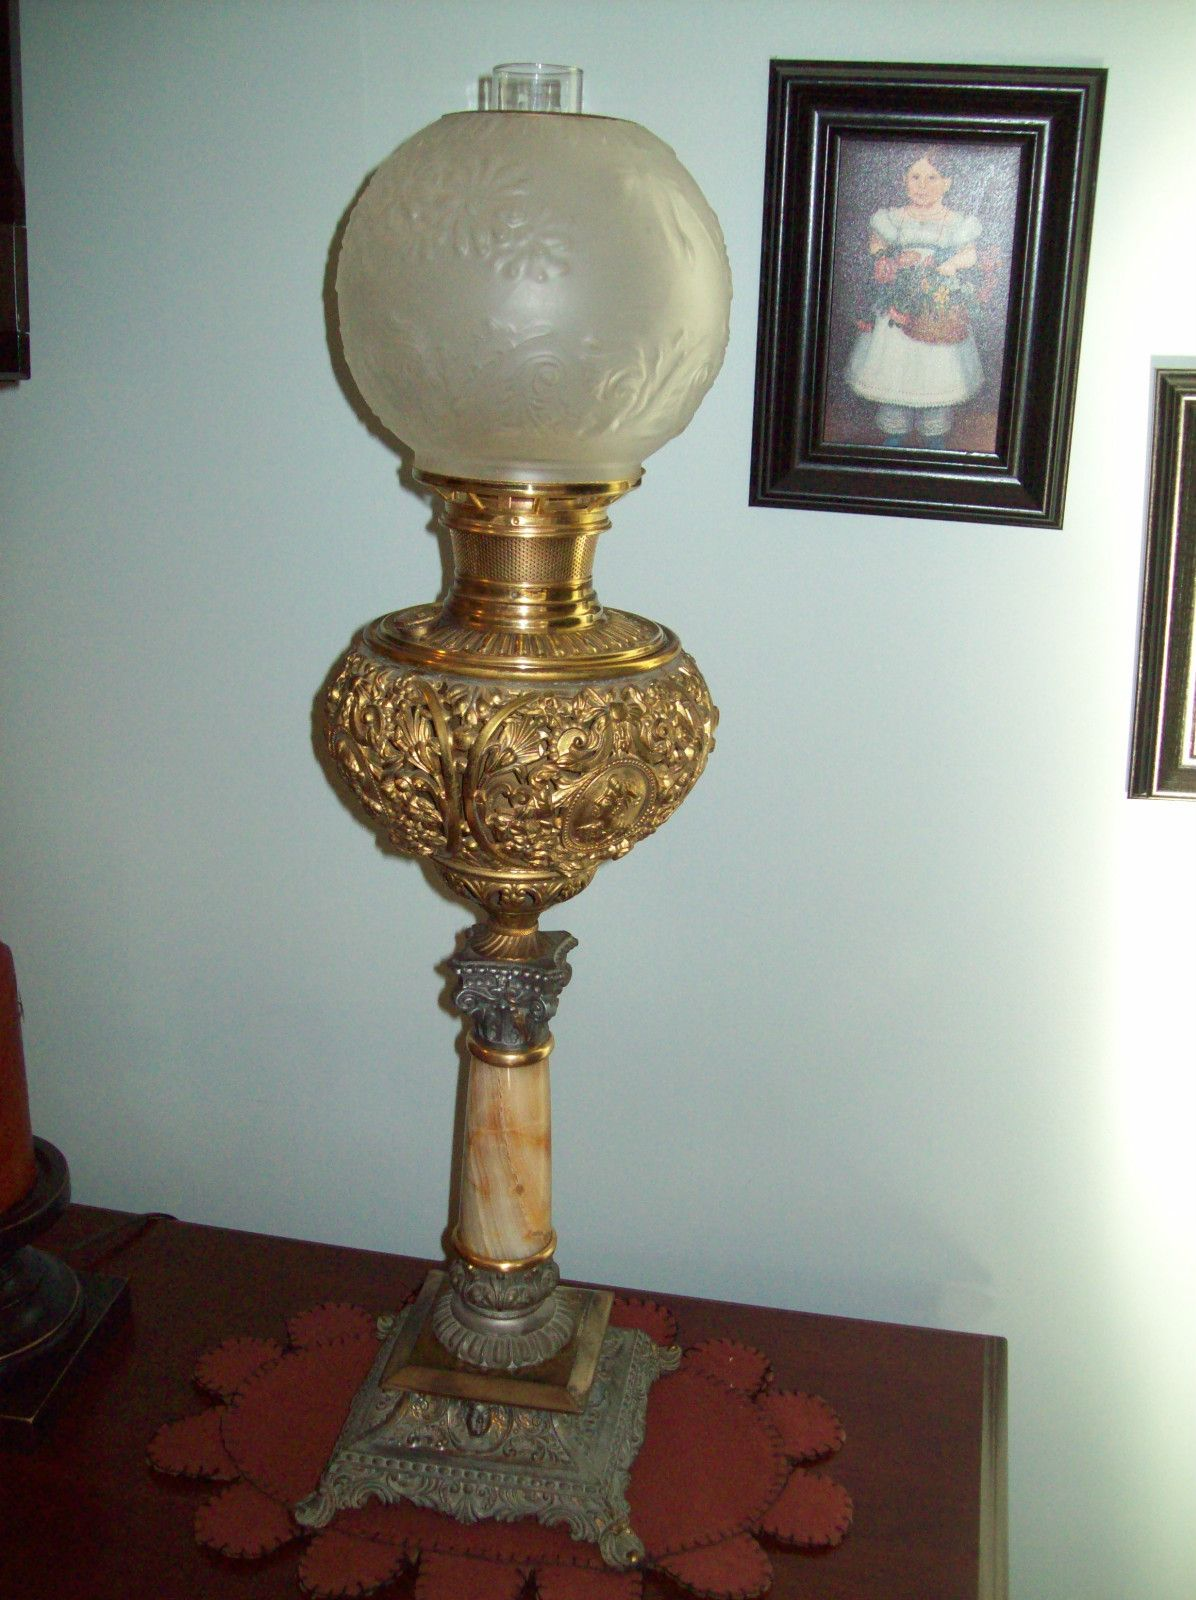 B GONE WITH THE WIND KEROSENE OIL LAMP VICTORIAN ERA 1890u0027S | eBay & B GONE WITH THE WIND KEROSENE OIL LAMP VICTORIAN ERA 1890u0027S | eBay ...